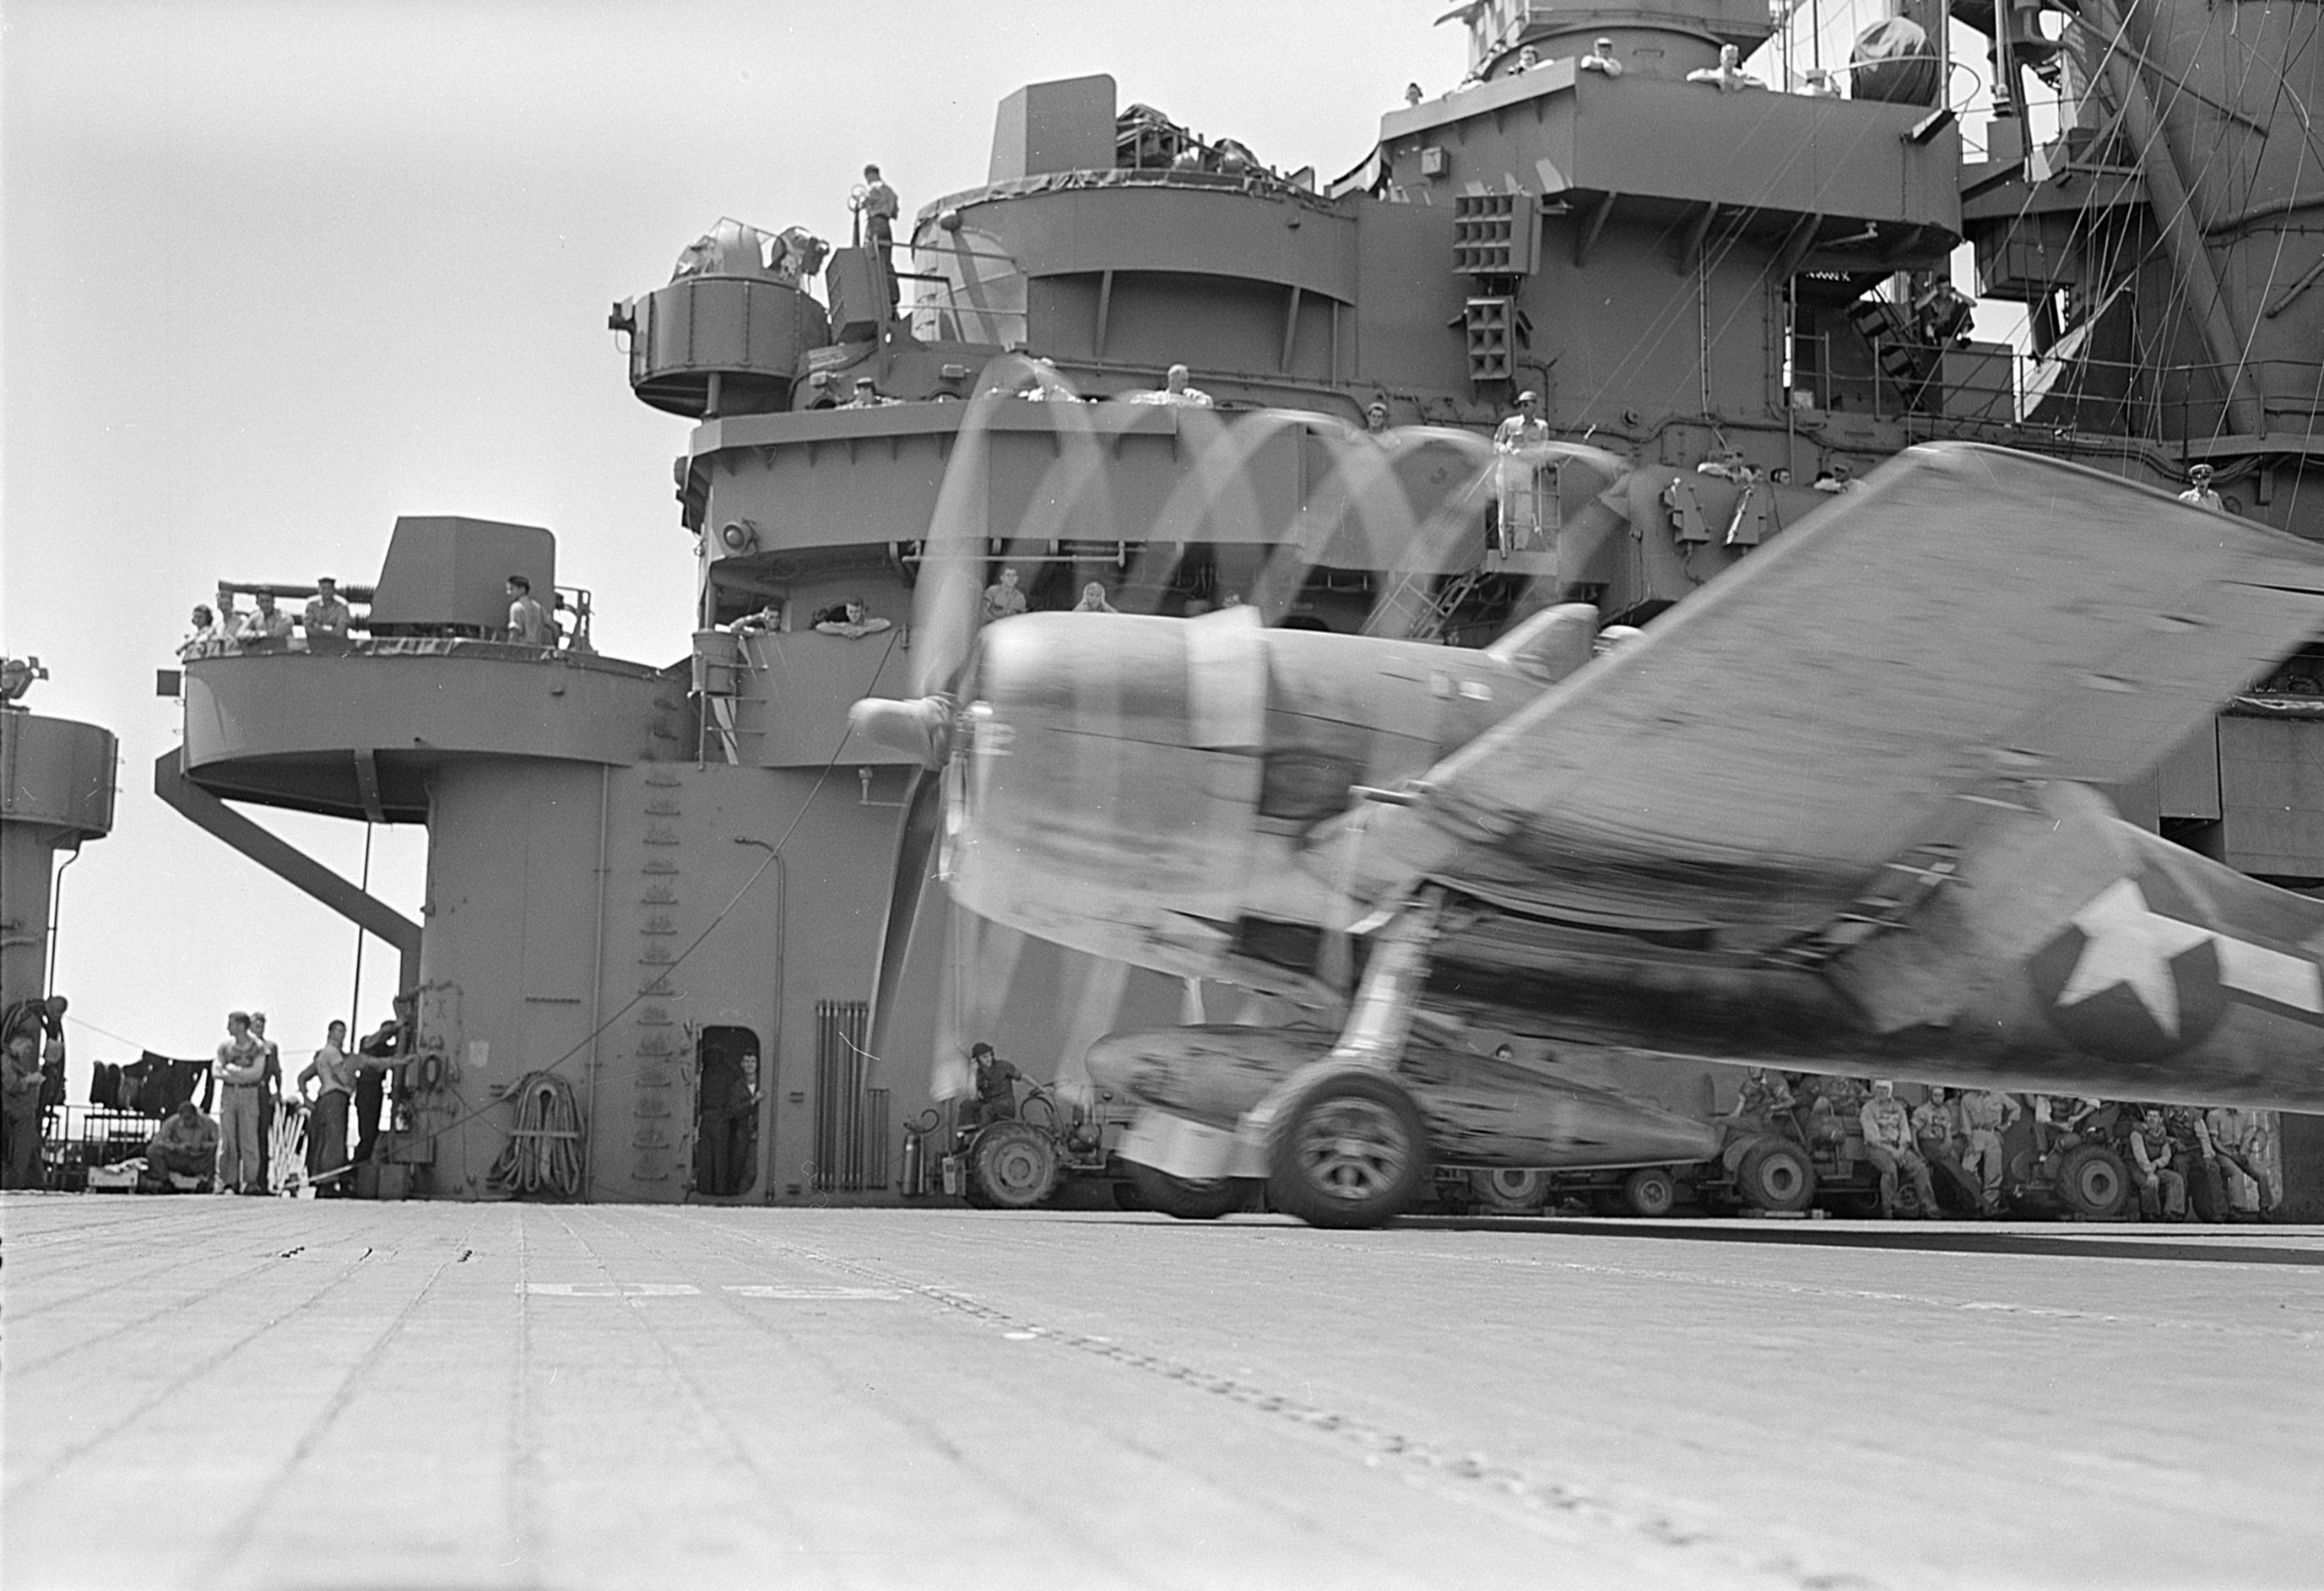 file f6f goes down deck for take-off of uss lexington  cv-16  - nara - 520898 jpg